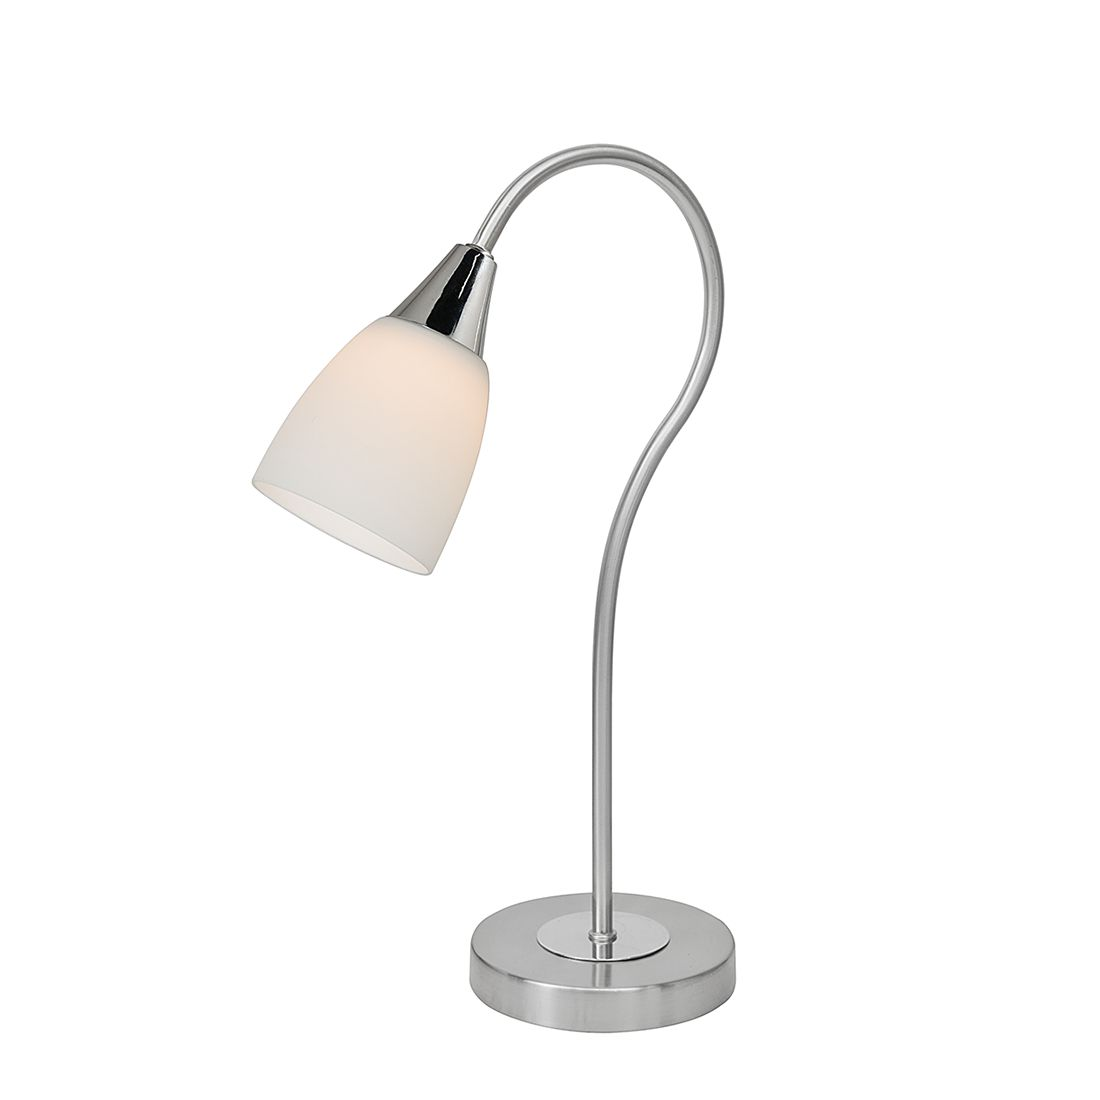 energie  A+, Tafellamp CASA - metaal/glas 1 lichtbron, Wofi